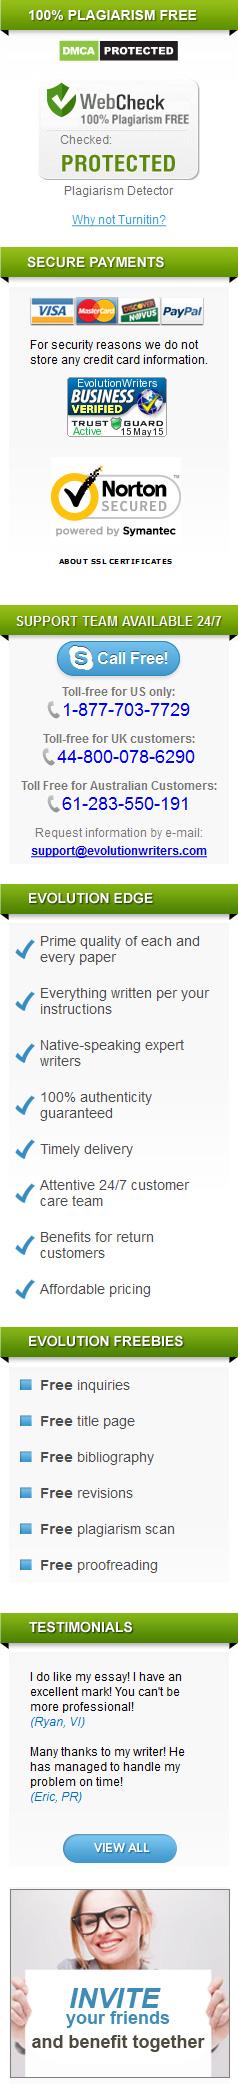 Essay Service Evolutionwriters com     Custom Writing Review Best Essay Writing Service Reviews Evolution Writers